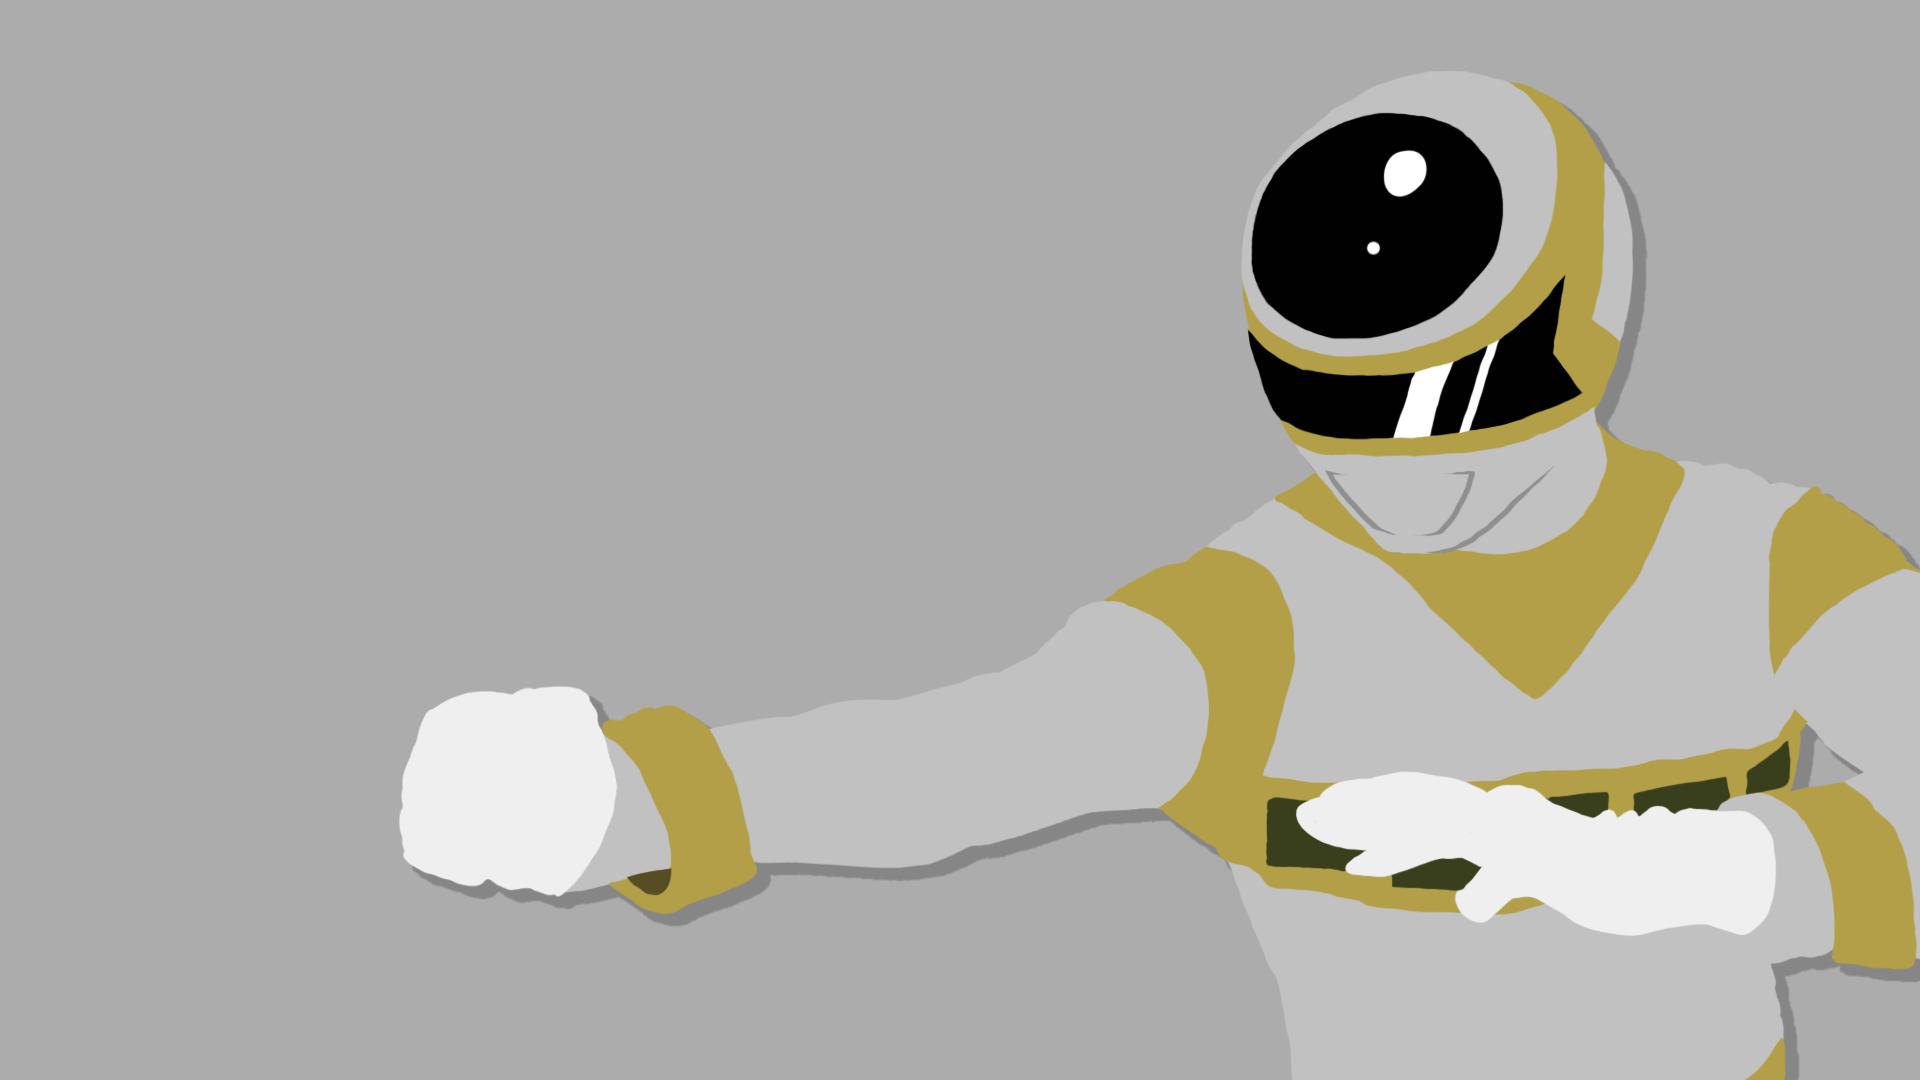 Silver Ranger Power Rangers In Space By Travp333 On Deviantart